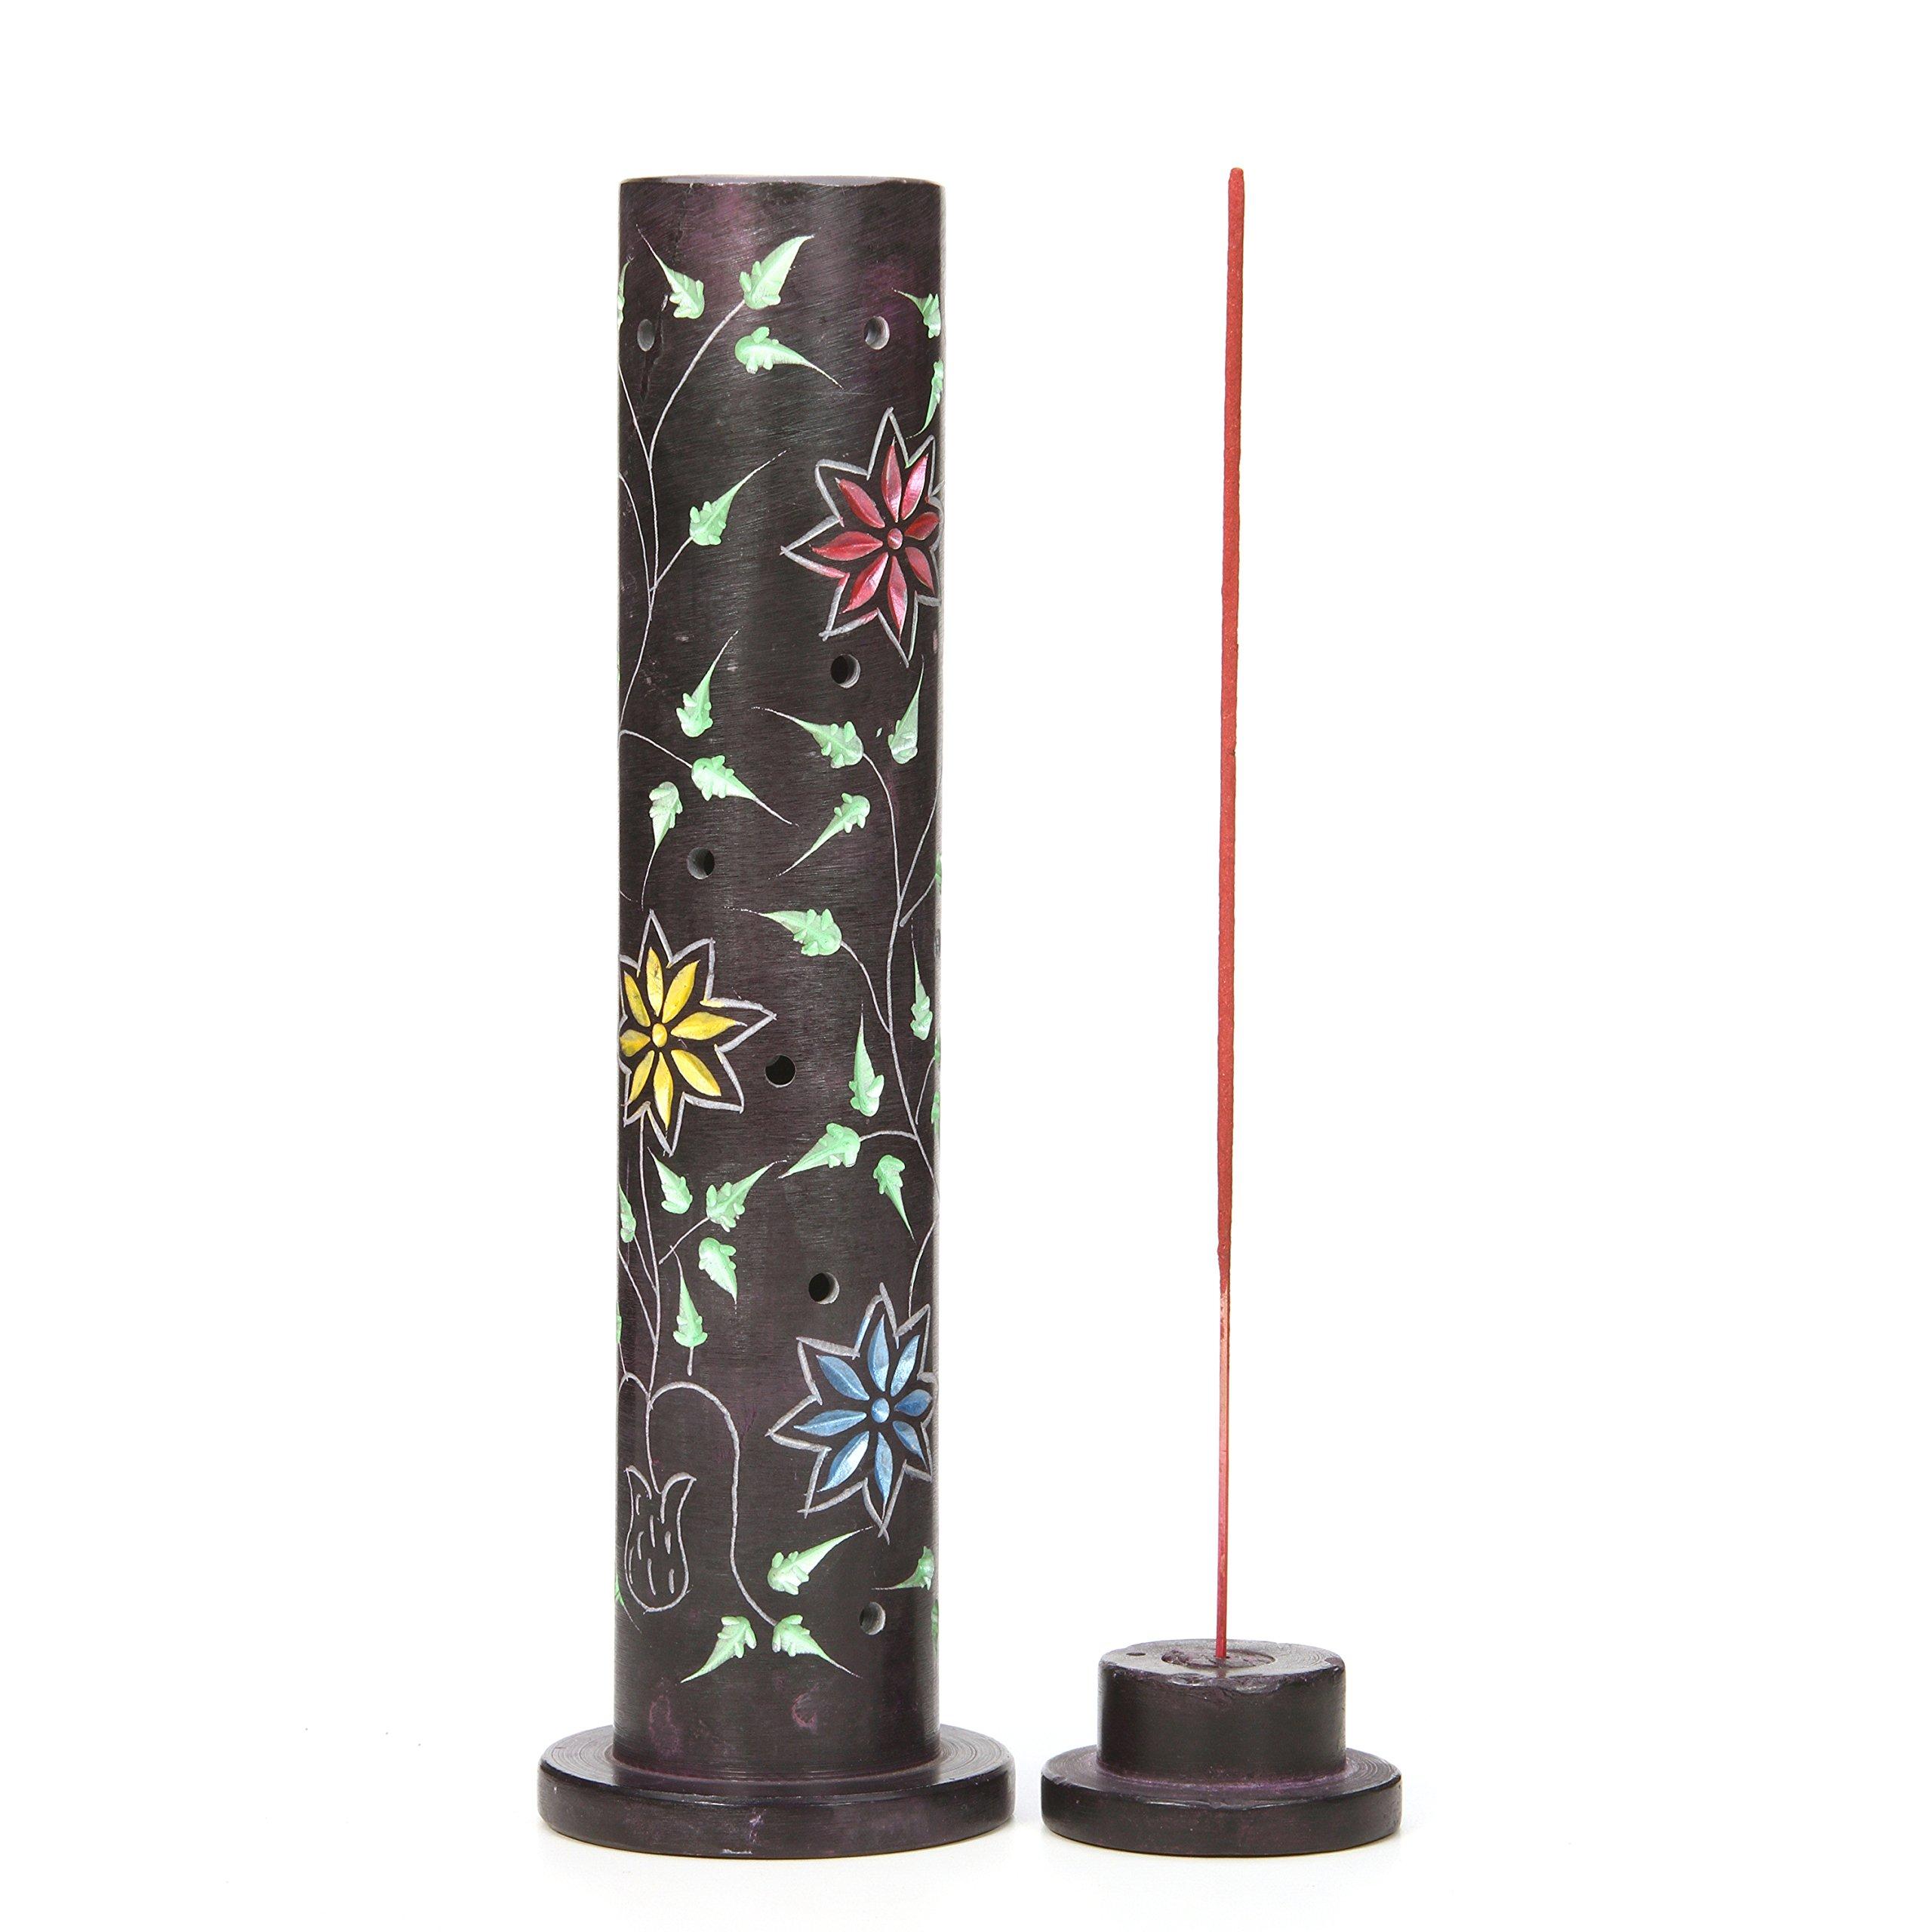 Hosley Aromatherapy 10.75'' High Soapstone Tower Incense Holder. Ideal for Aromatherapy, Zen, Spa, Vastu, Reiki Chakra Settings. O4